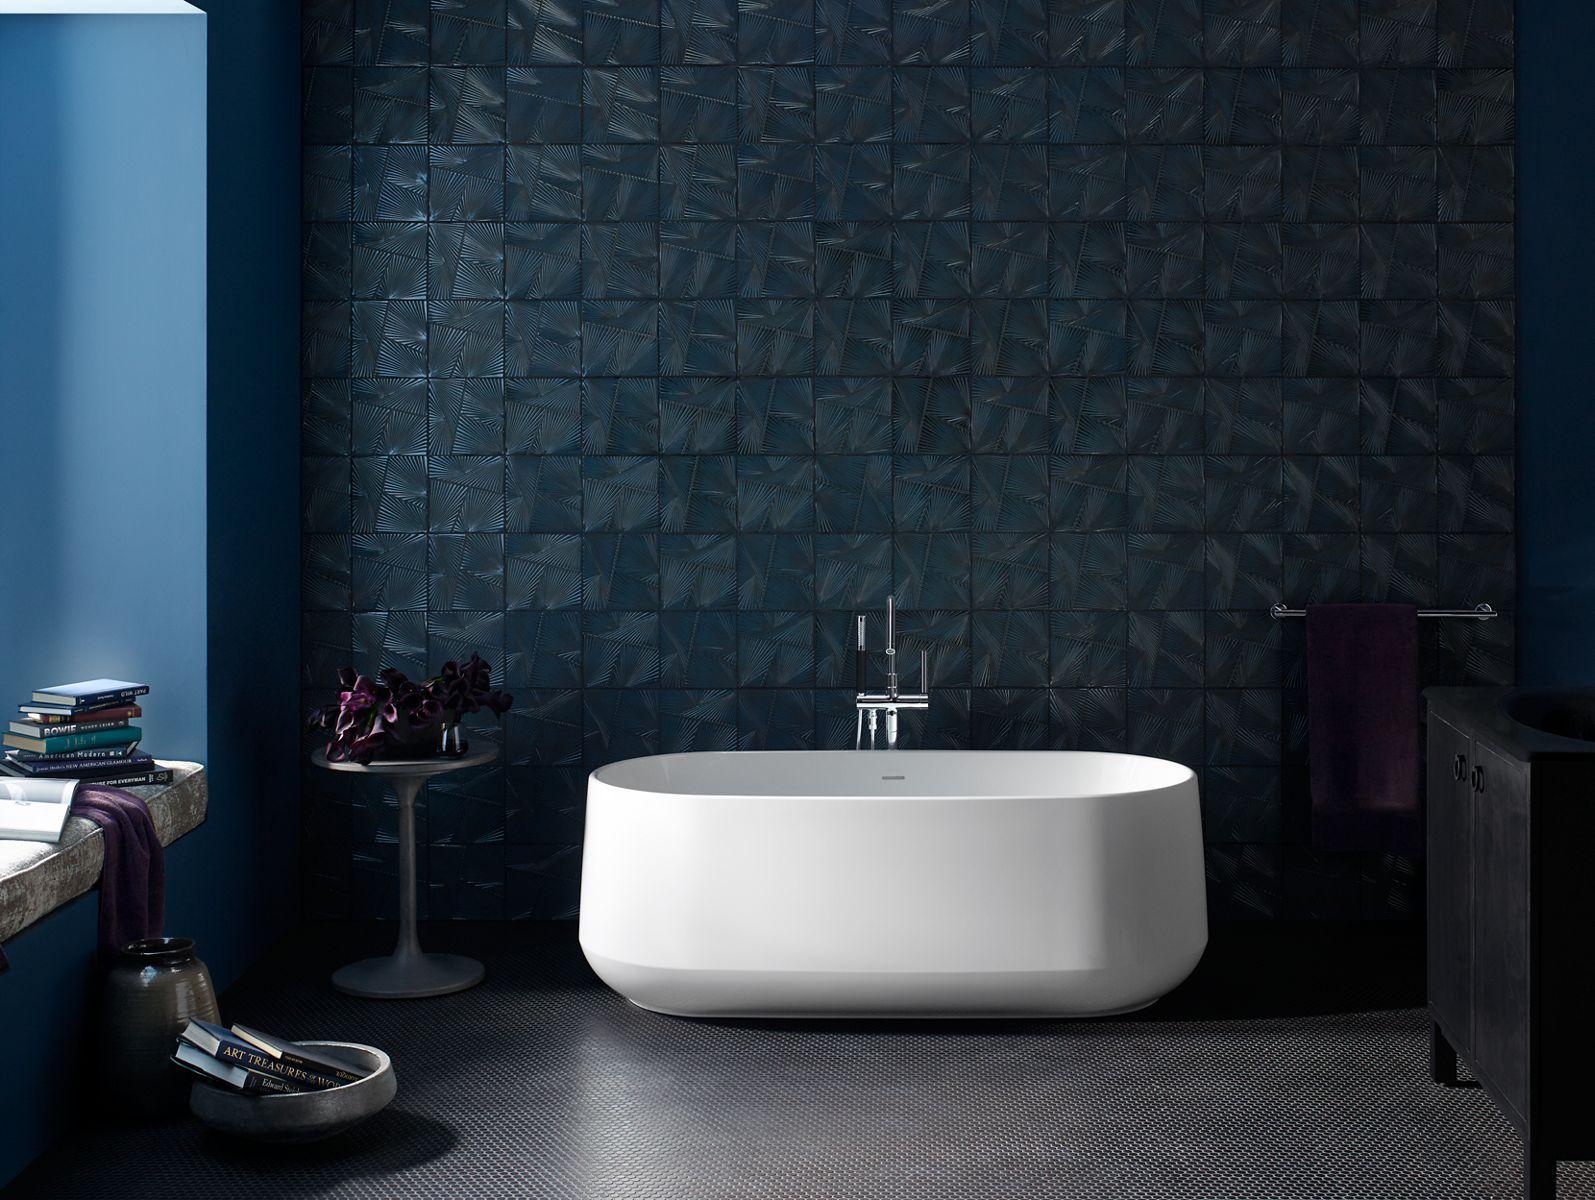 Freestanding Bathtubs Whirlpool Bathing Products Bathroom KOHLER